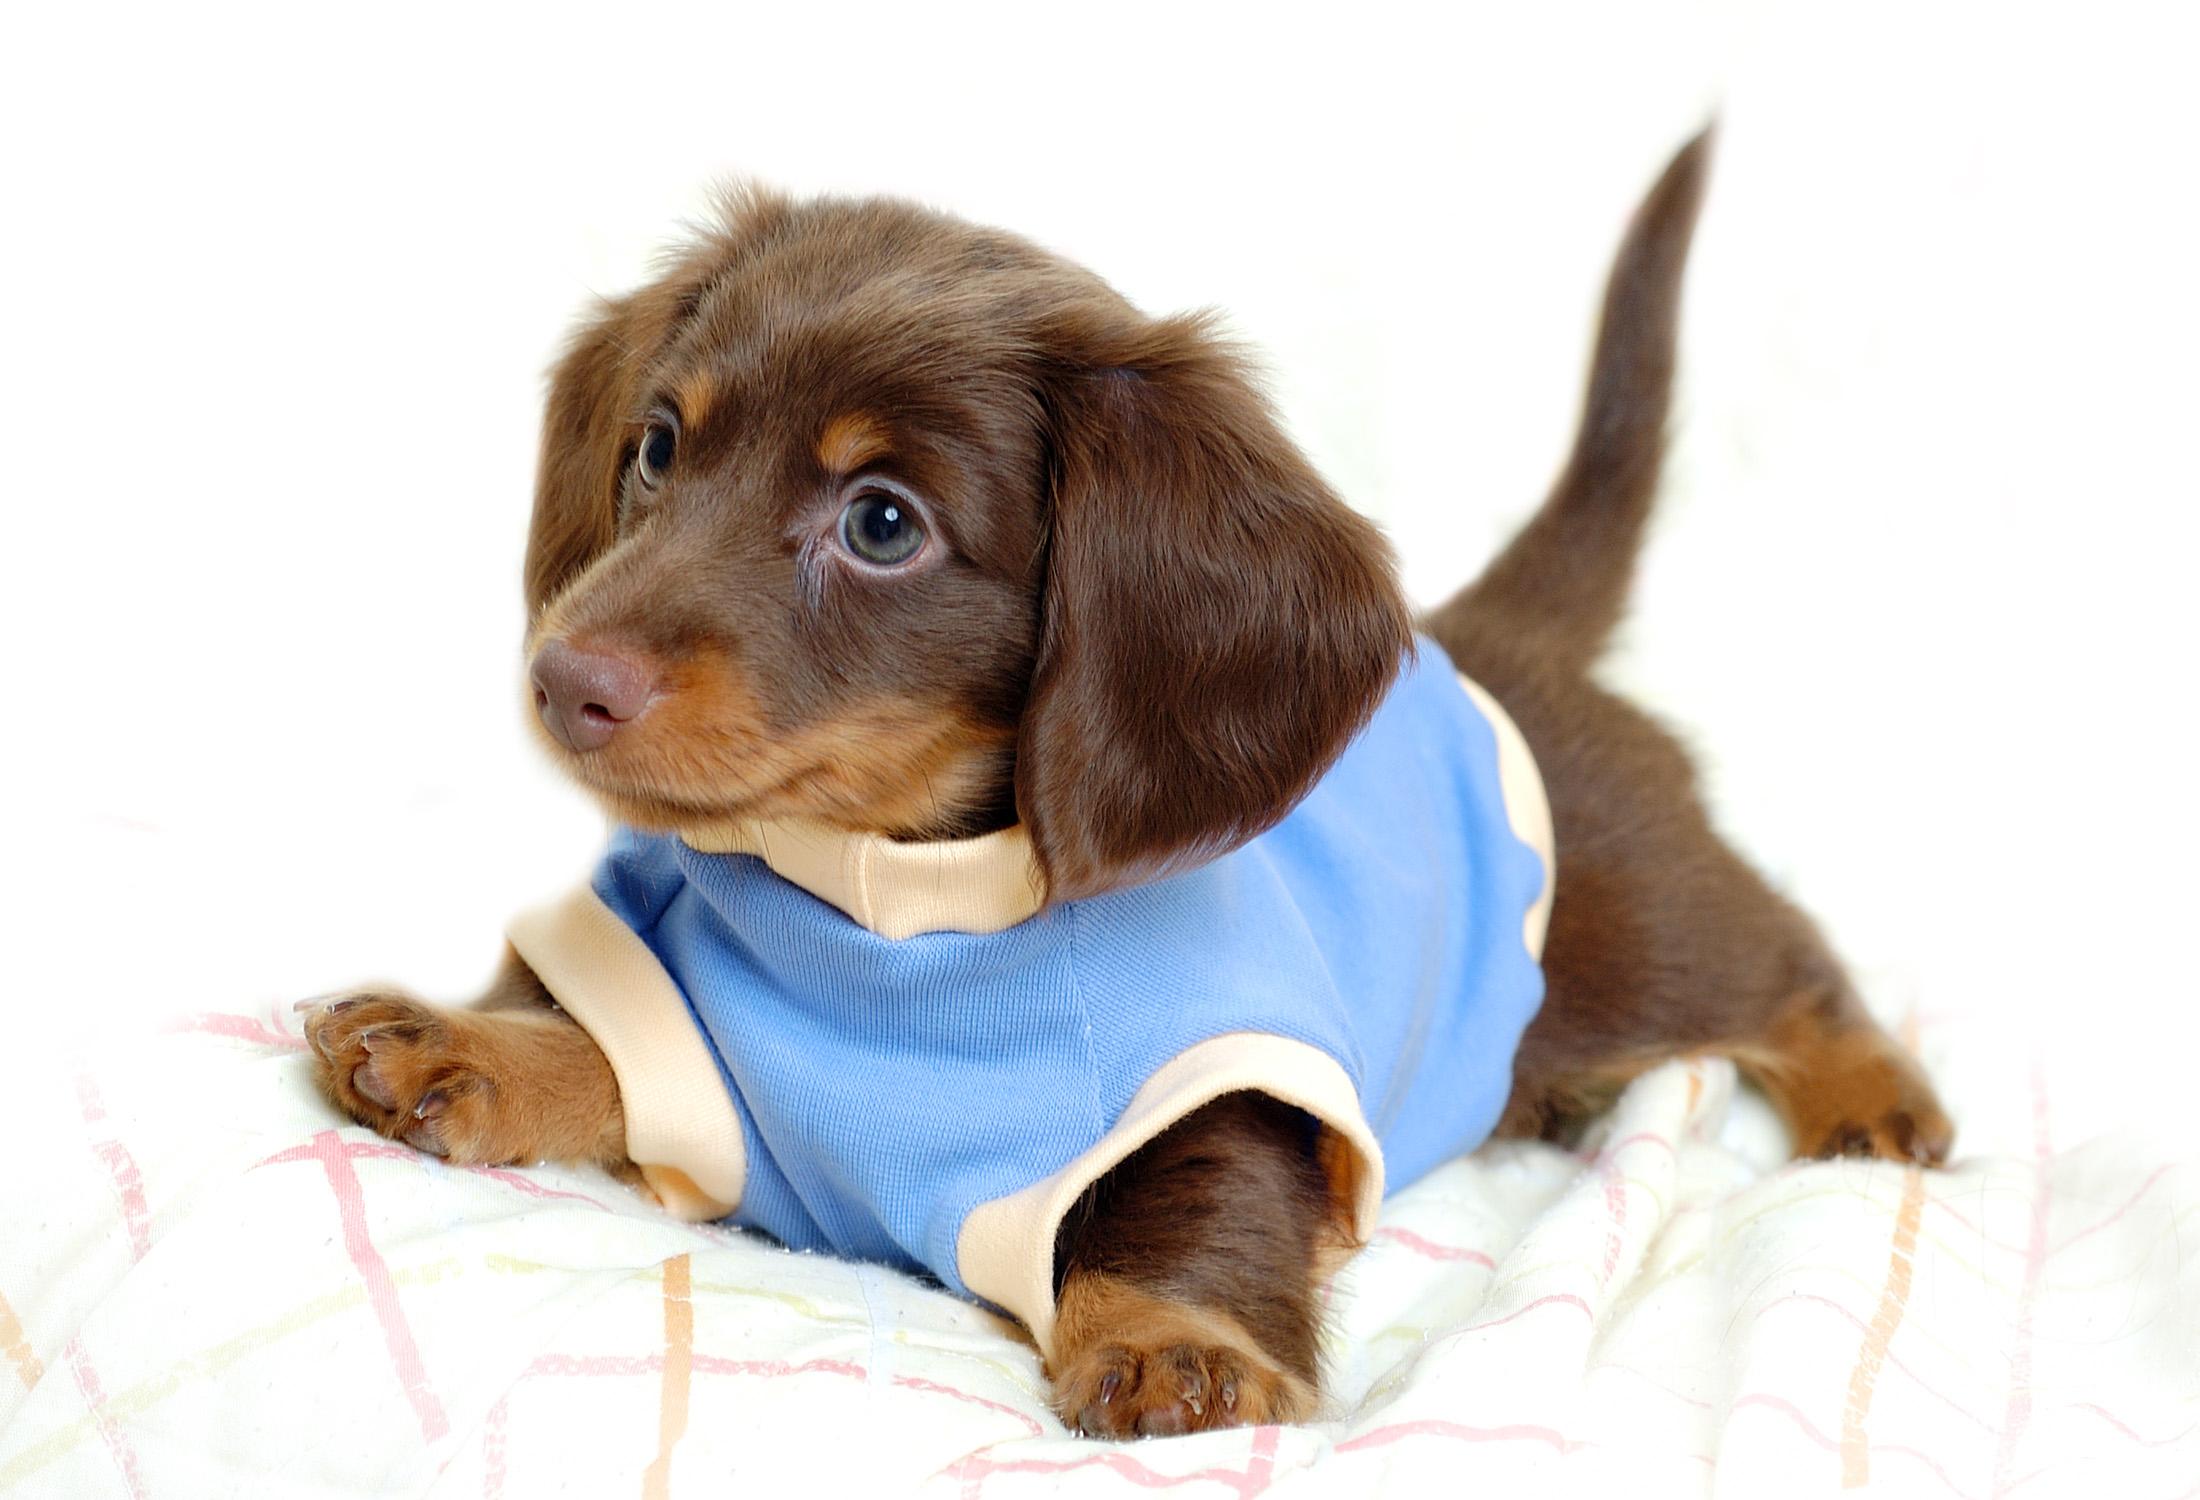 download wallpaper: teckel puppy wallpaper